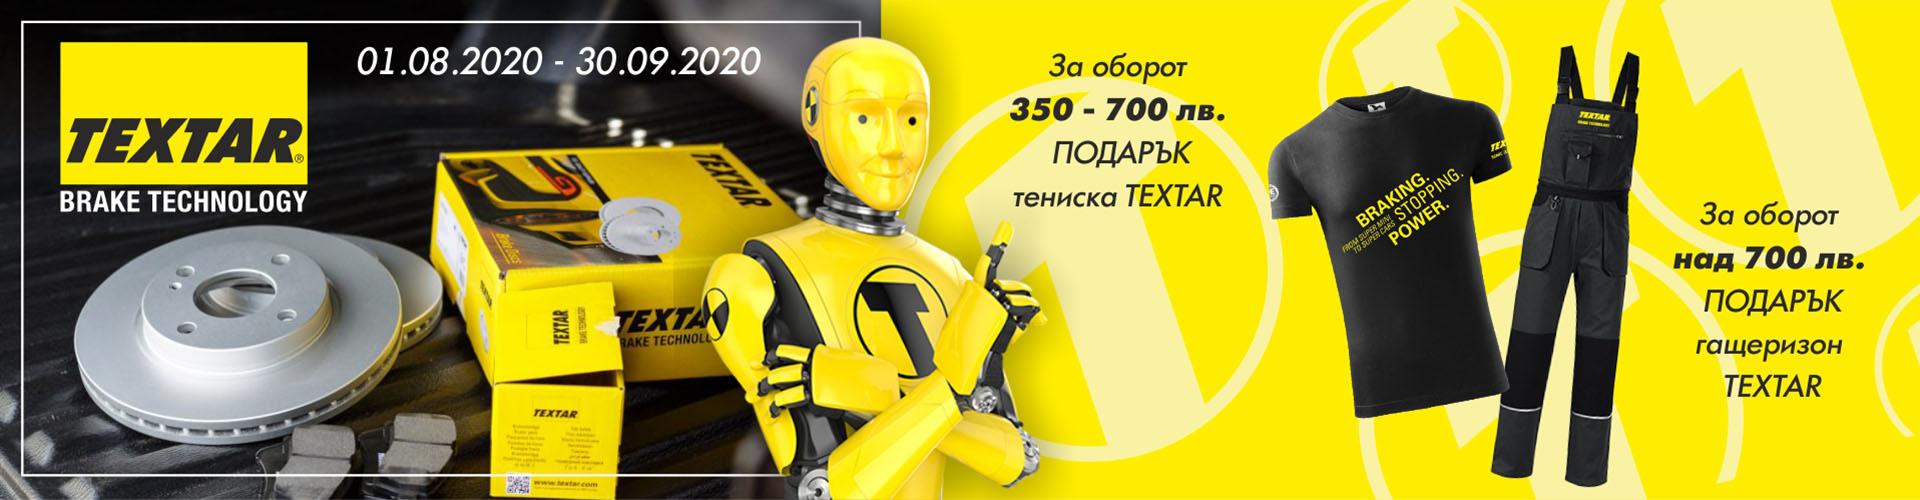 promo_textar_01.08.2020-30.09.2020_banner.jpg